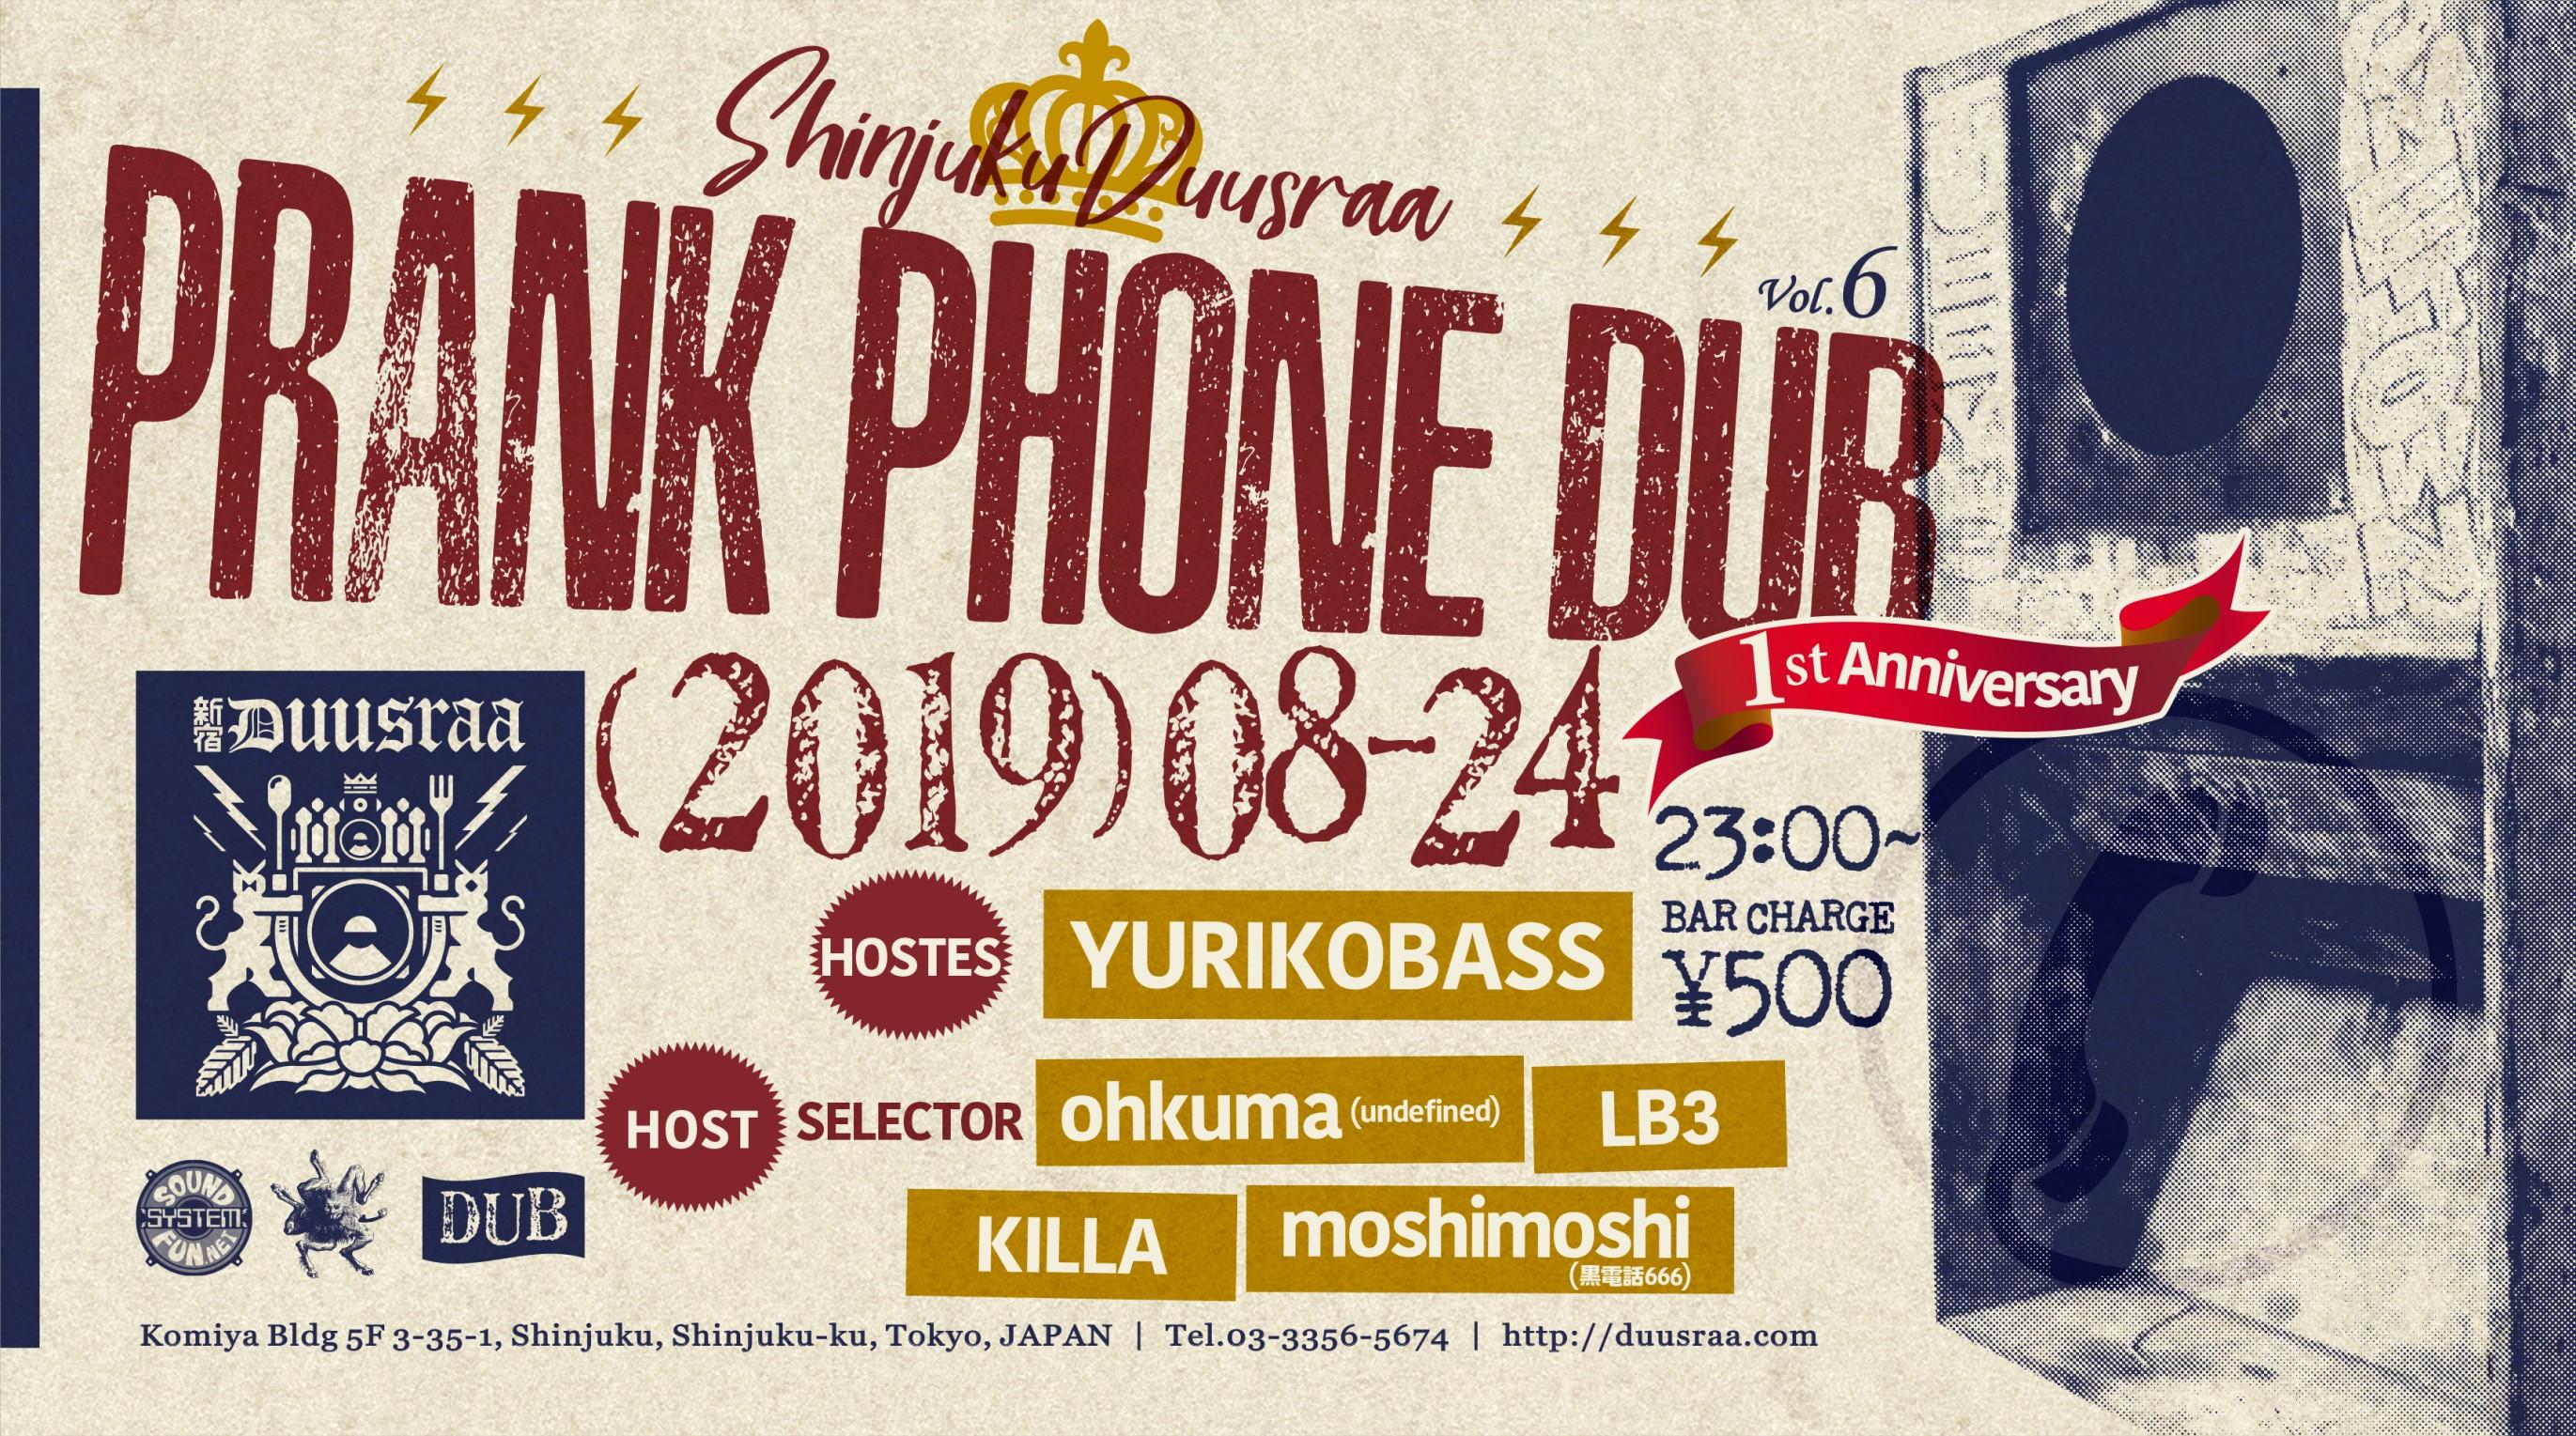 PRANK PHONE DUB 1st Anniversary